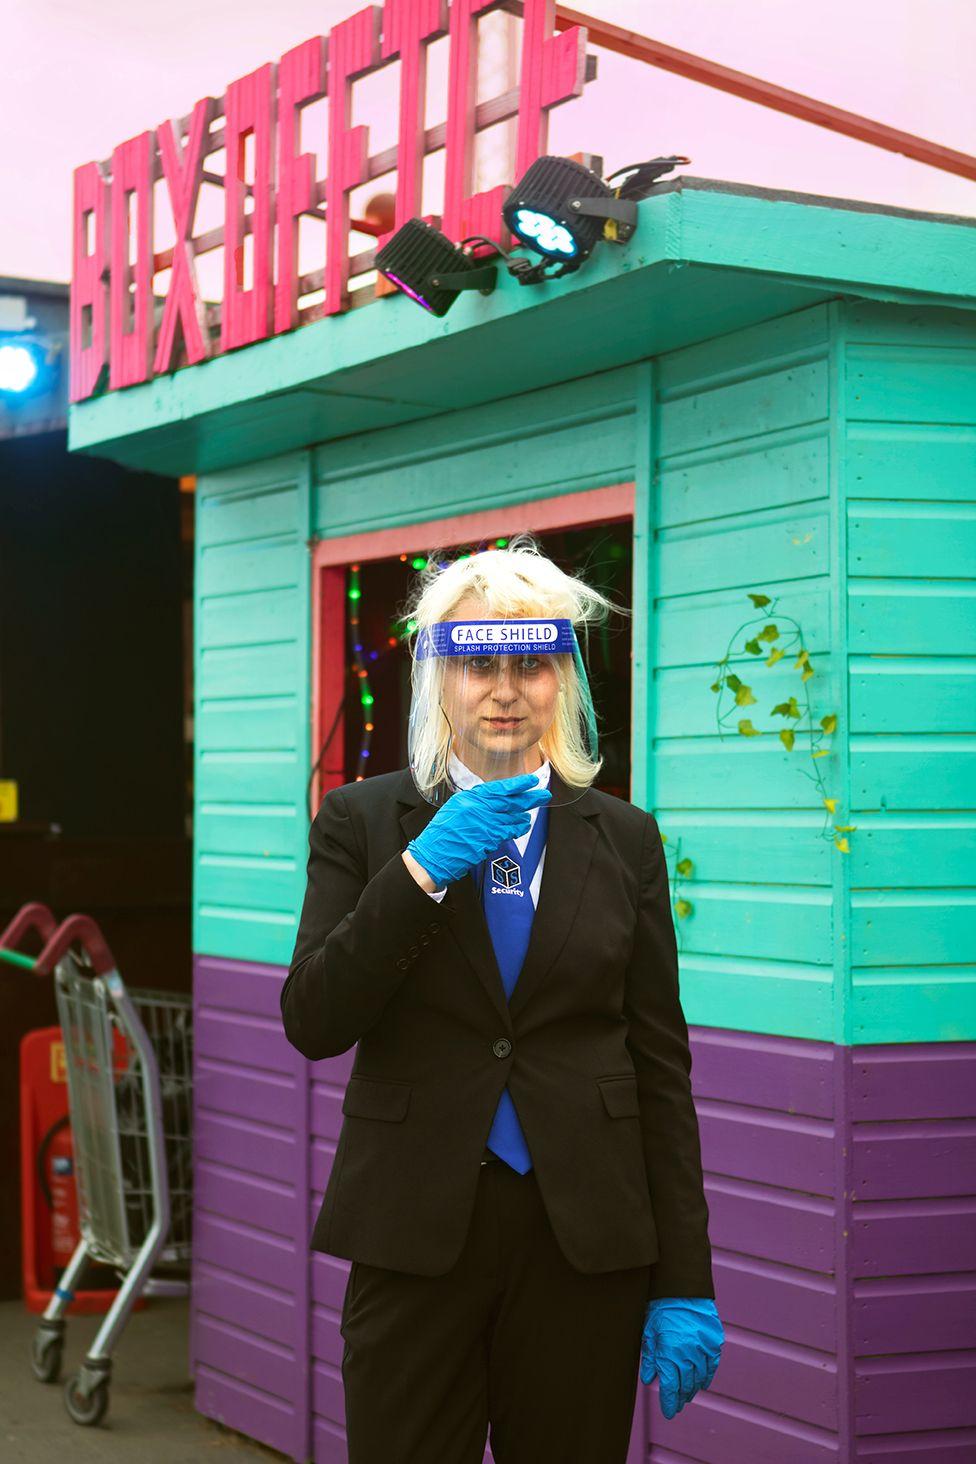 Birute, staff member at Roof East, Stratford, London. 4 July 2020